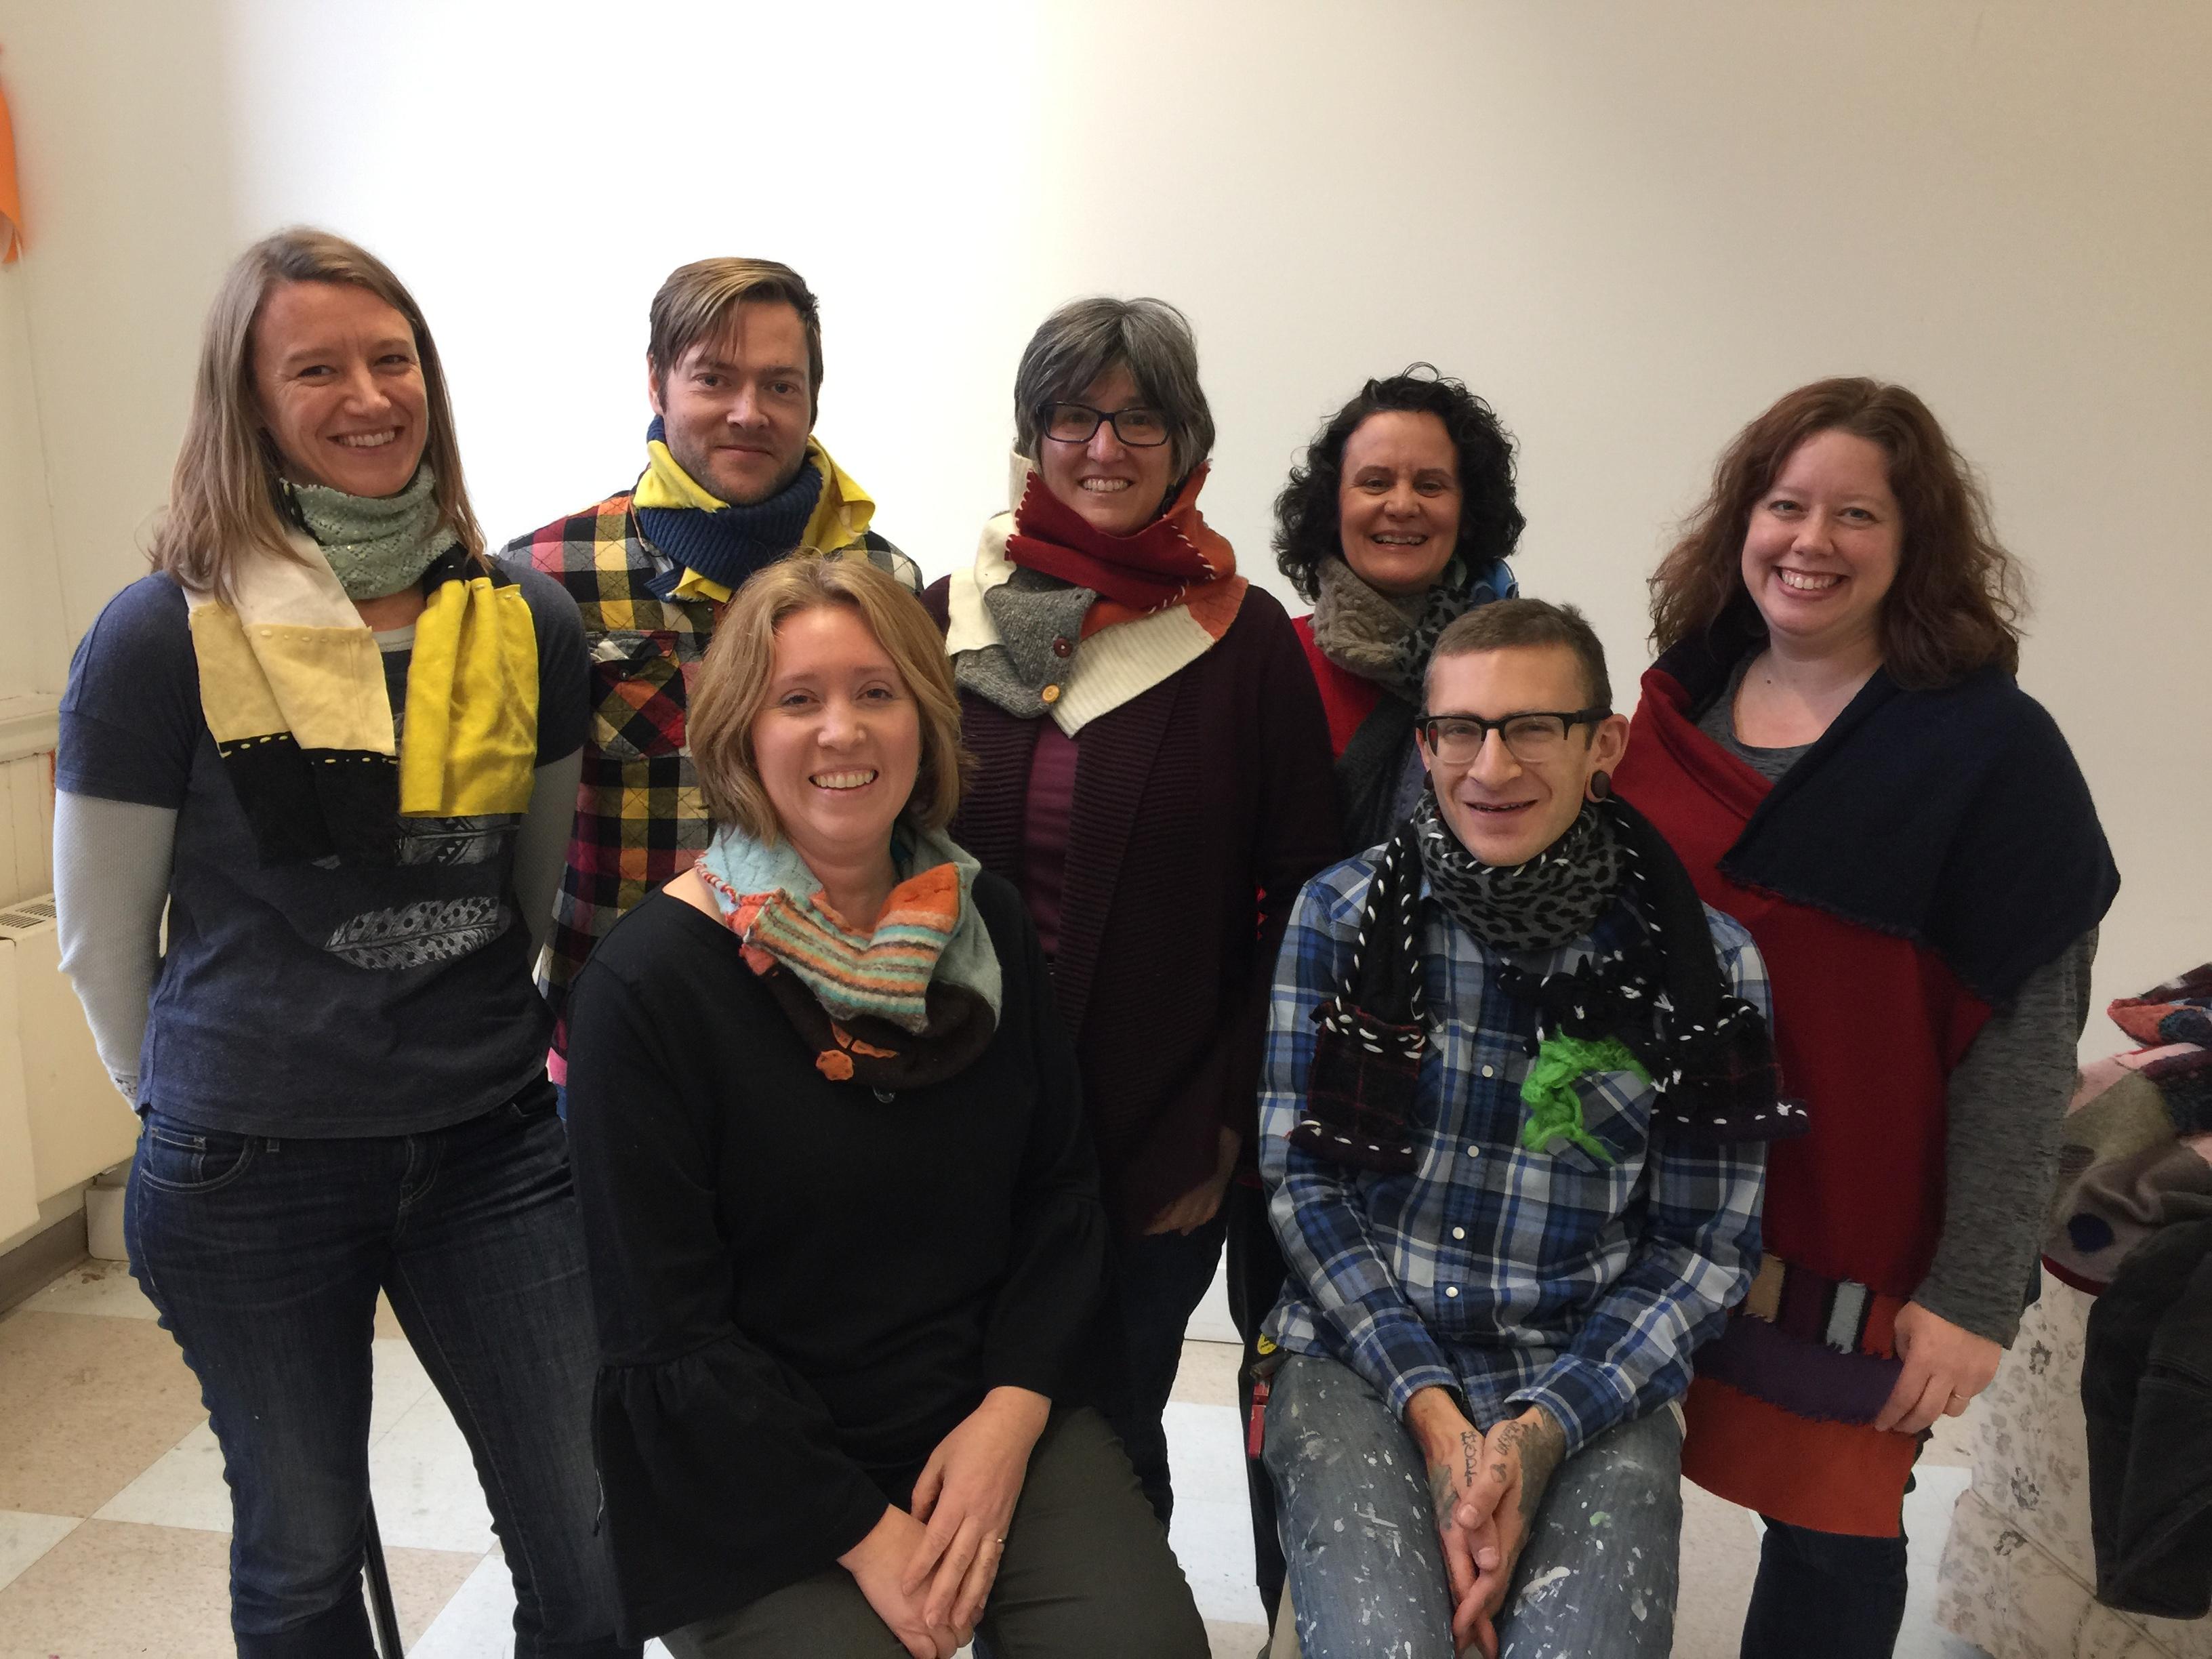 handmade, craft school experience, snow farm staff, crispina ffrench